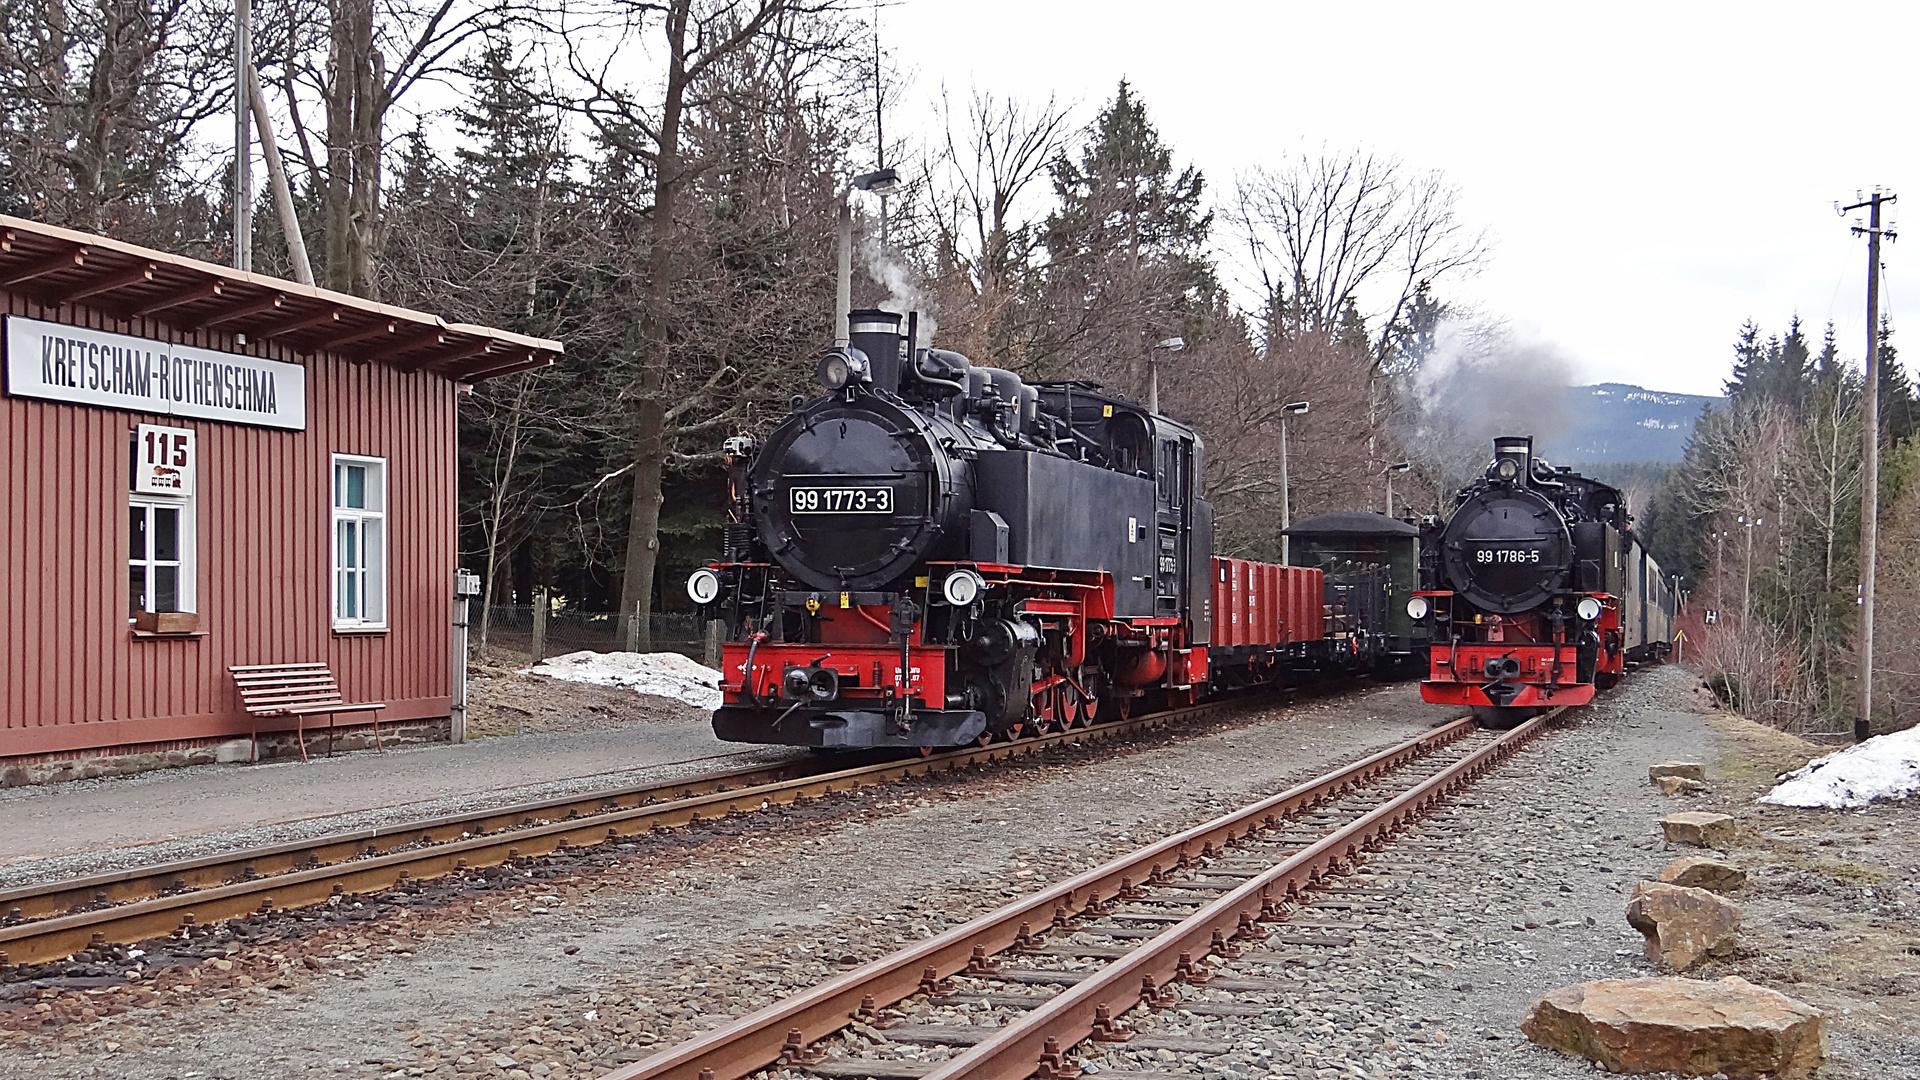 Zugüberholung in Kretscham-Rothensehma